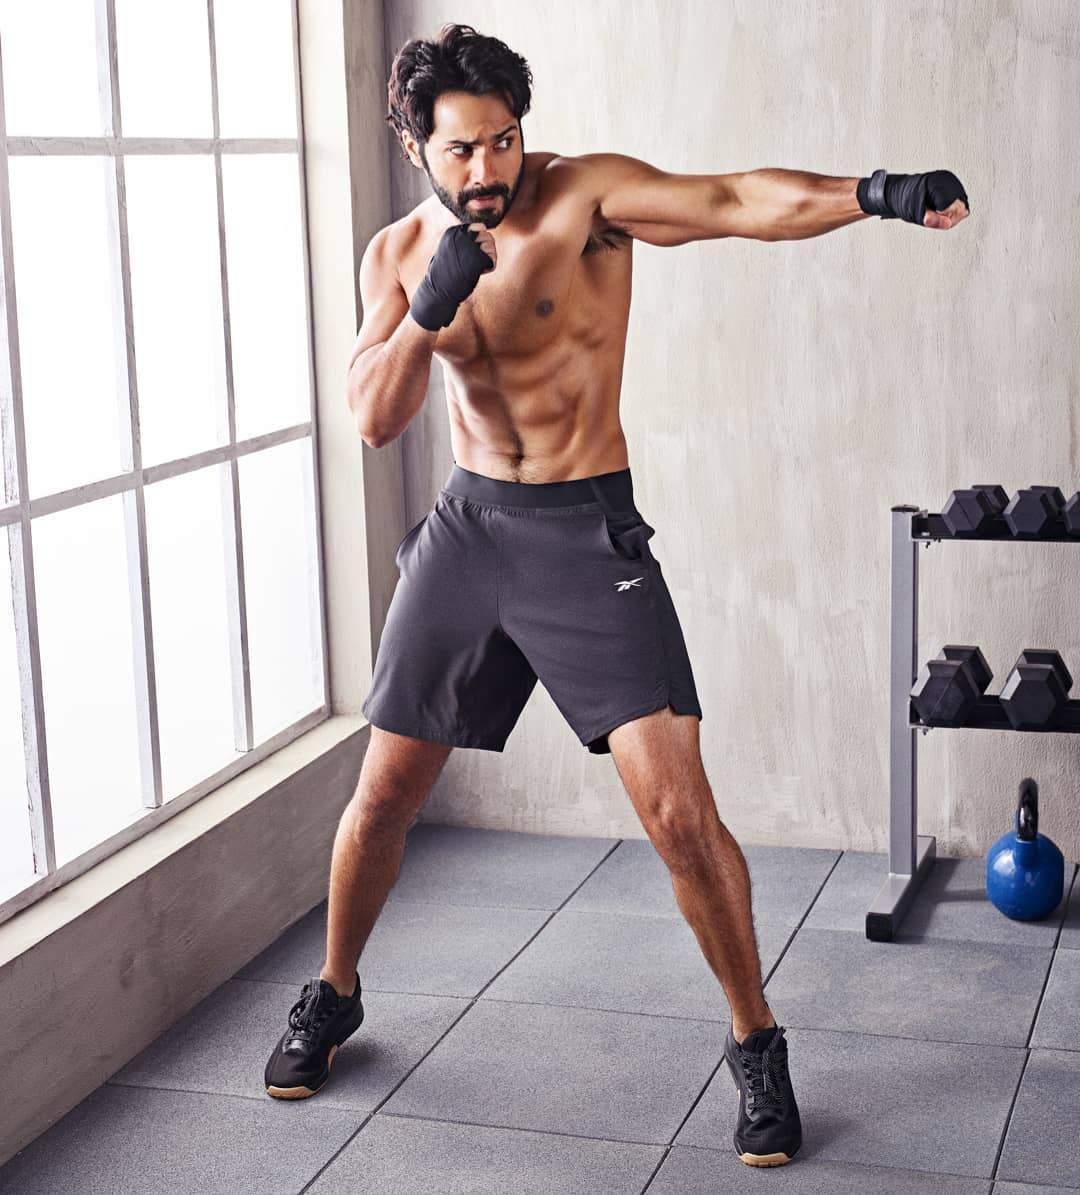 Varun Dhawan's six pack abs